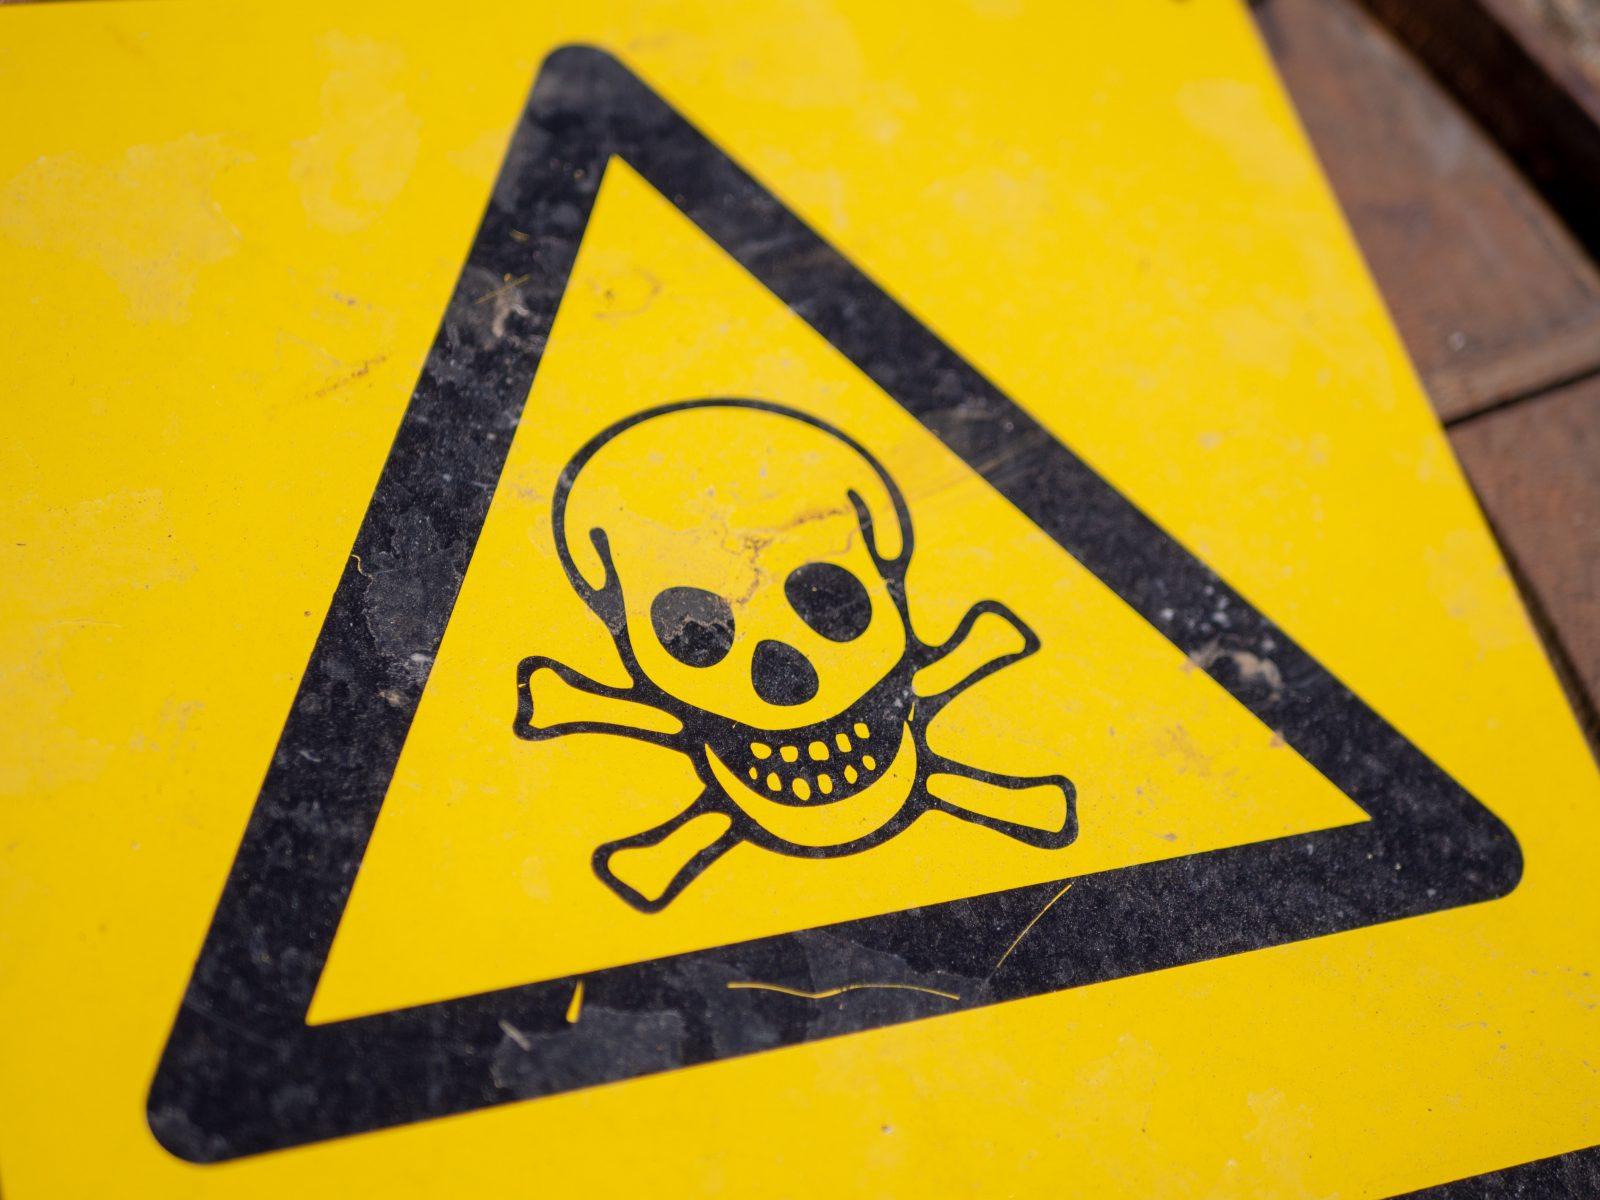 Danger sign representing credit risk